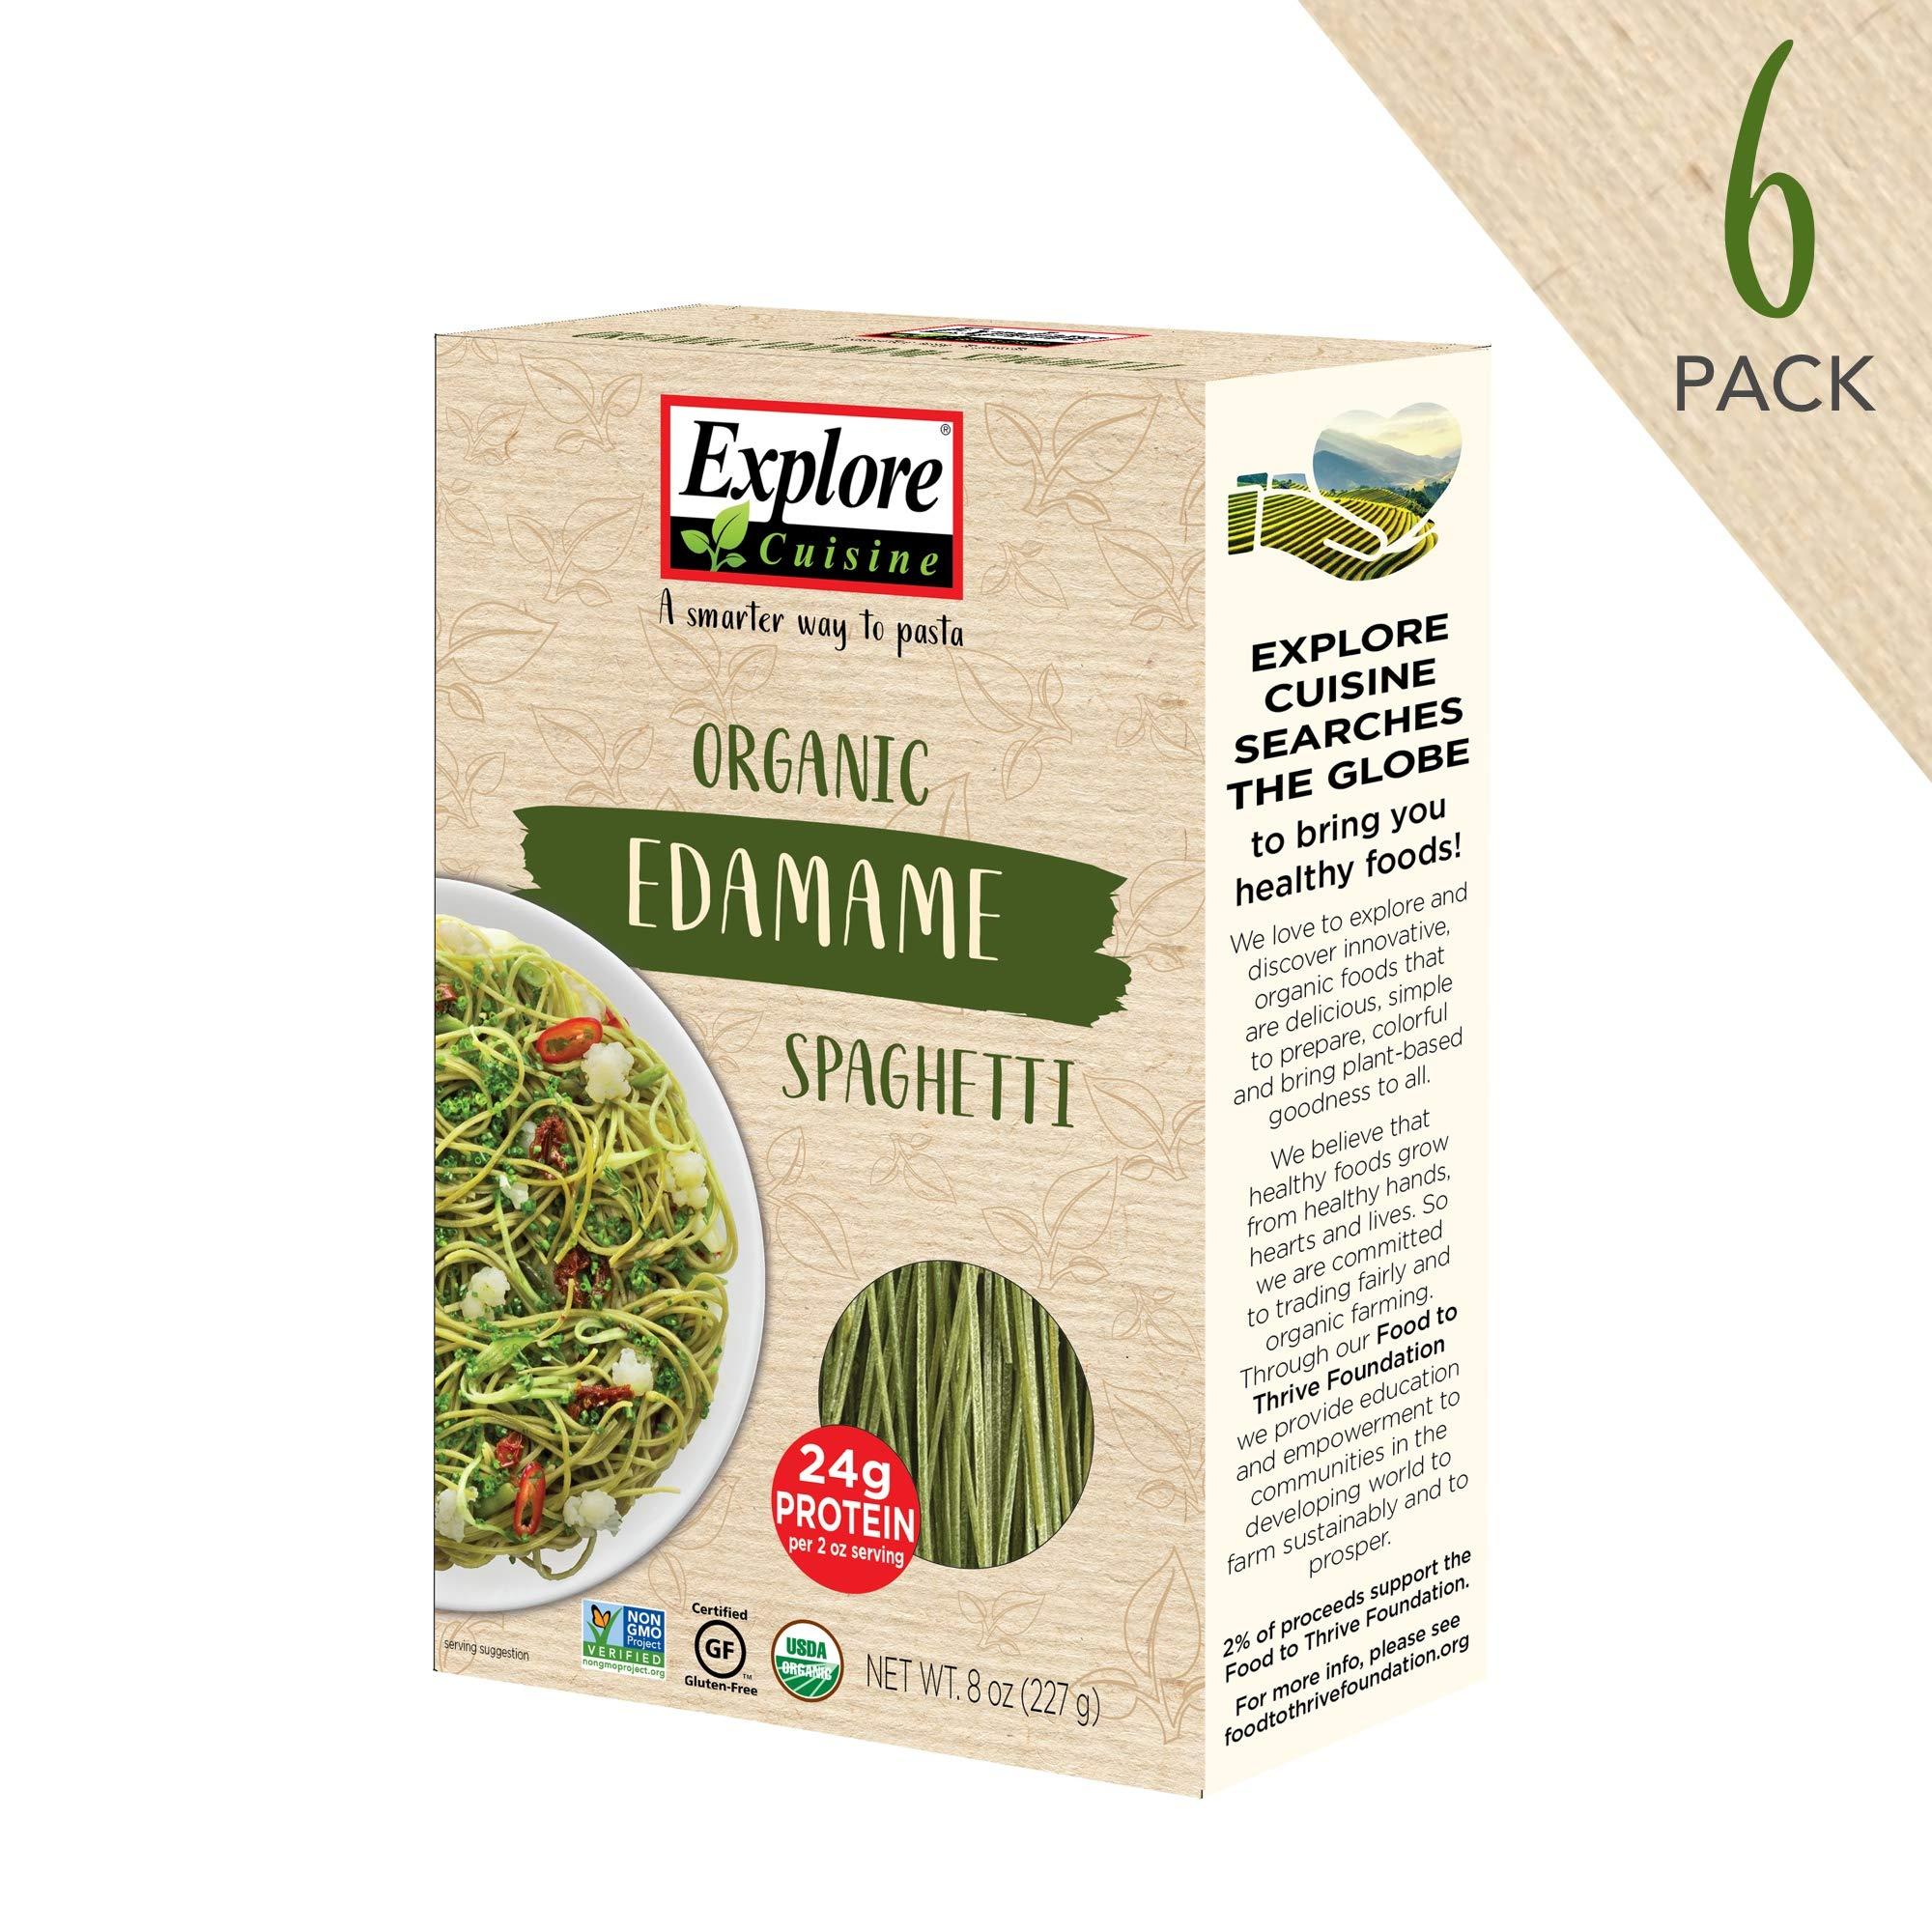 Explore Cuisine Organic Edamame Spaghetti (6 Pack) - 8 oz - High Protein, Gluten Free Pasta, Easy to Make - USDA Certified Organic, Vegan, Kosher, Non GMO - 24 Total Servings by EXPLORE CUISINE